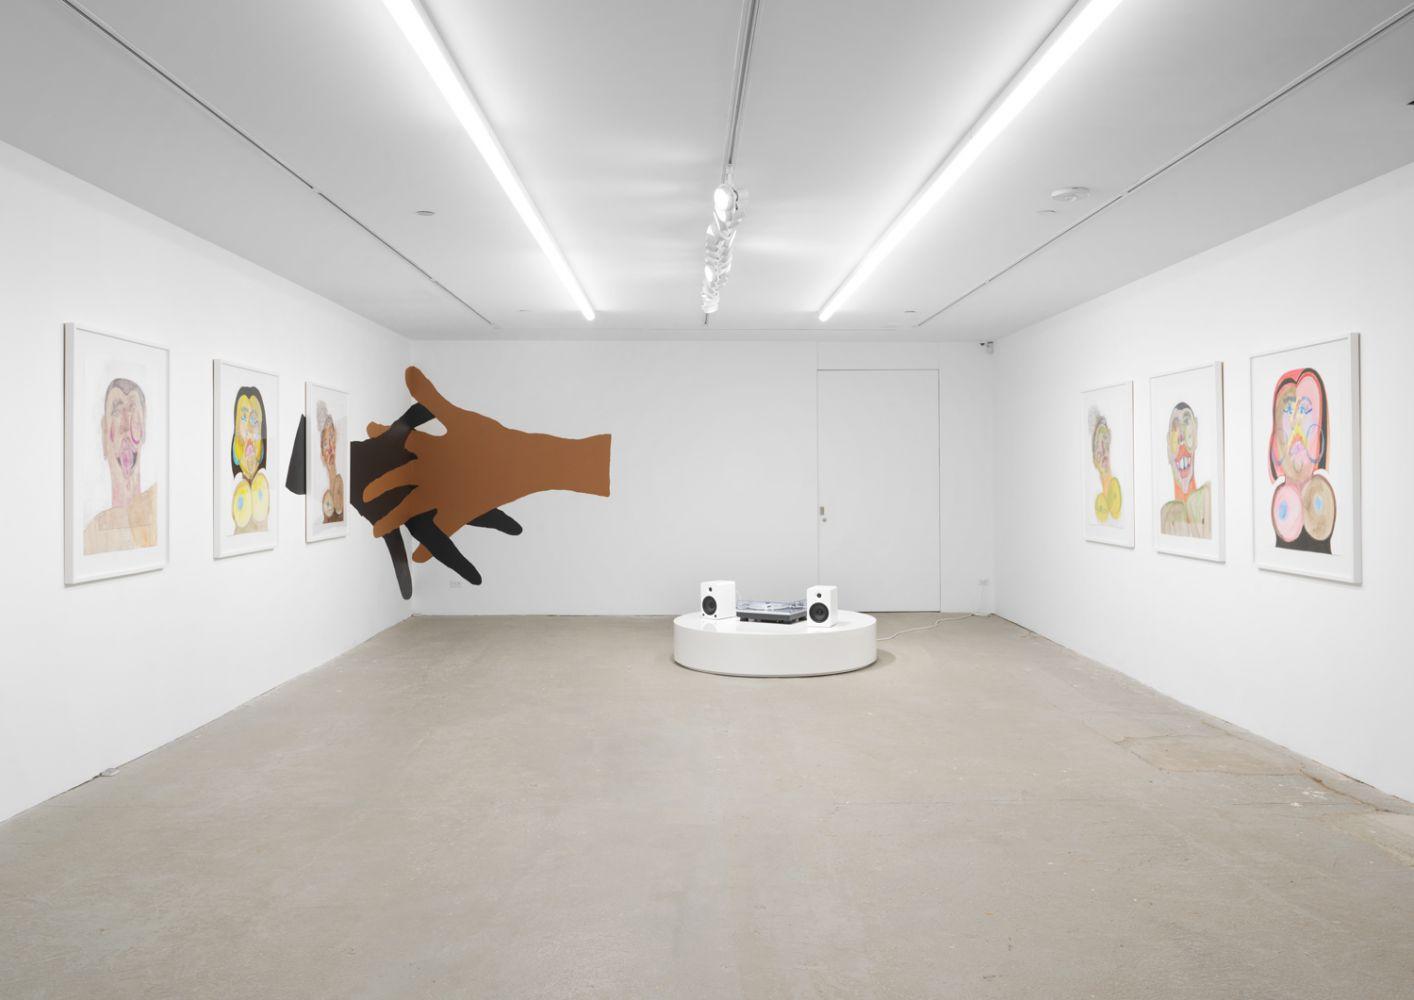 Exhibition View, Tschabalala Self, Cotton Mouth, Eva Presenhuber, New York, 2020 install 13